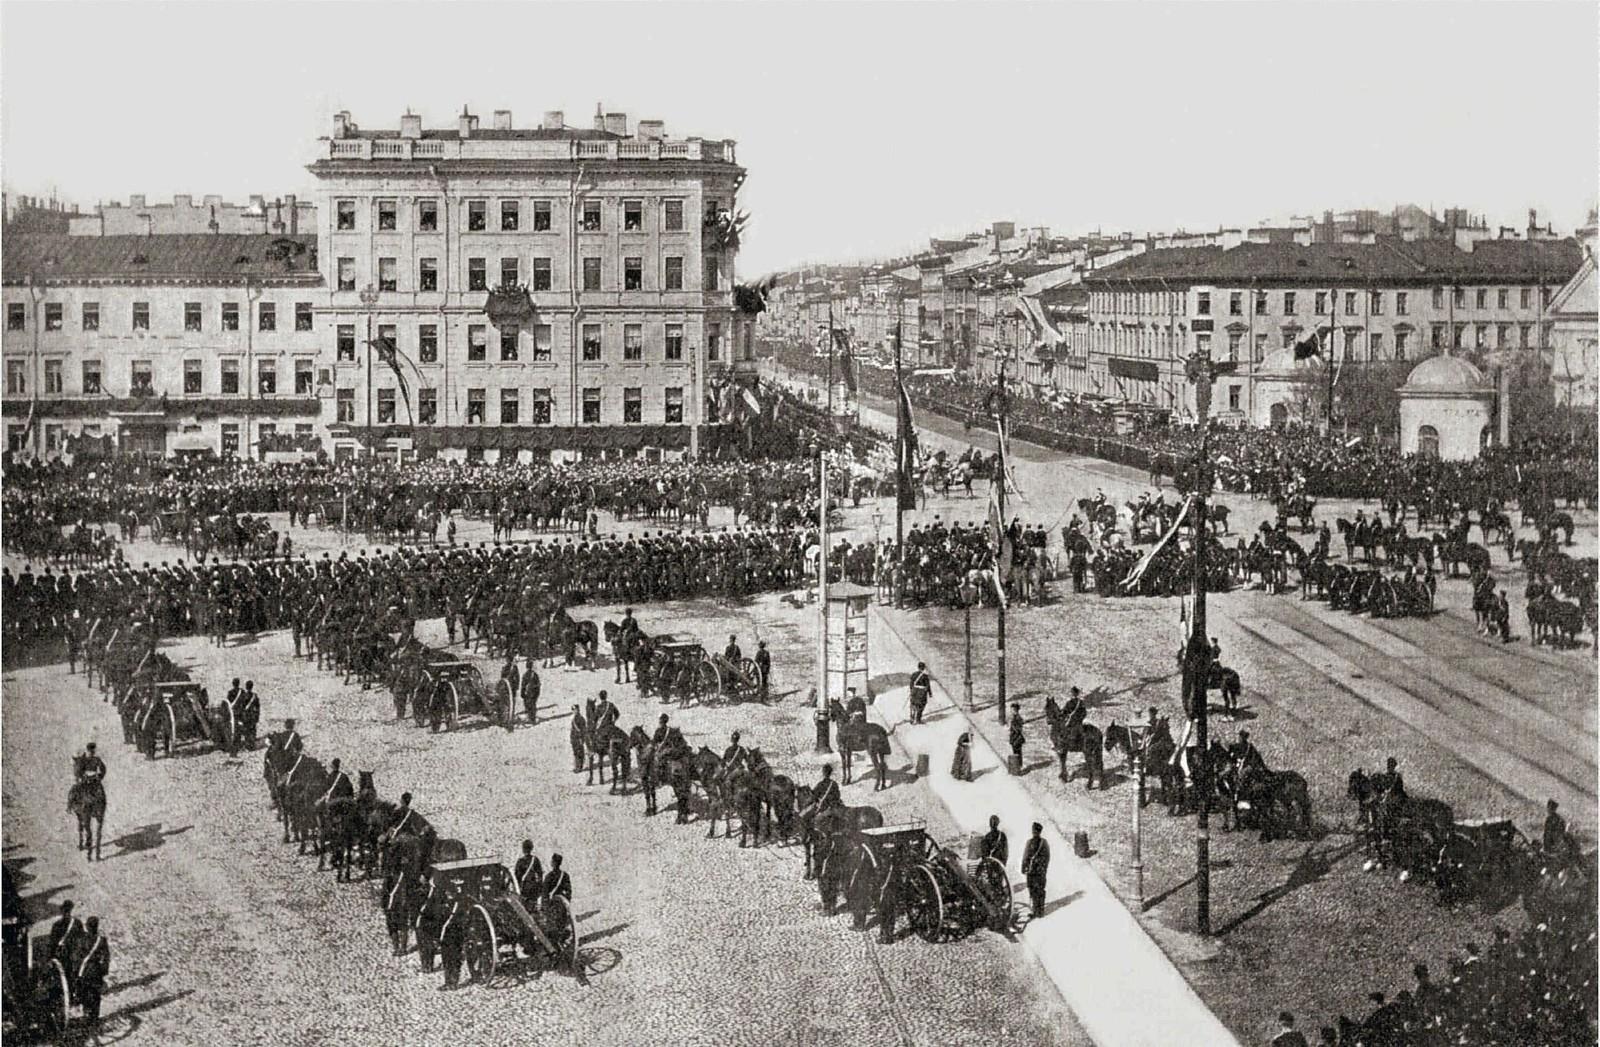 1897. Подготовка к встрече австрийского императора Франца-Иосифа I на Знаменской площади